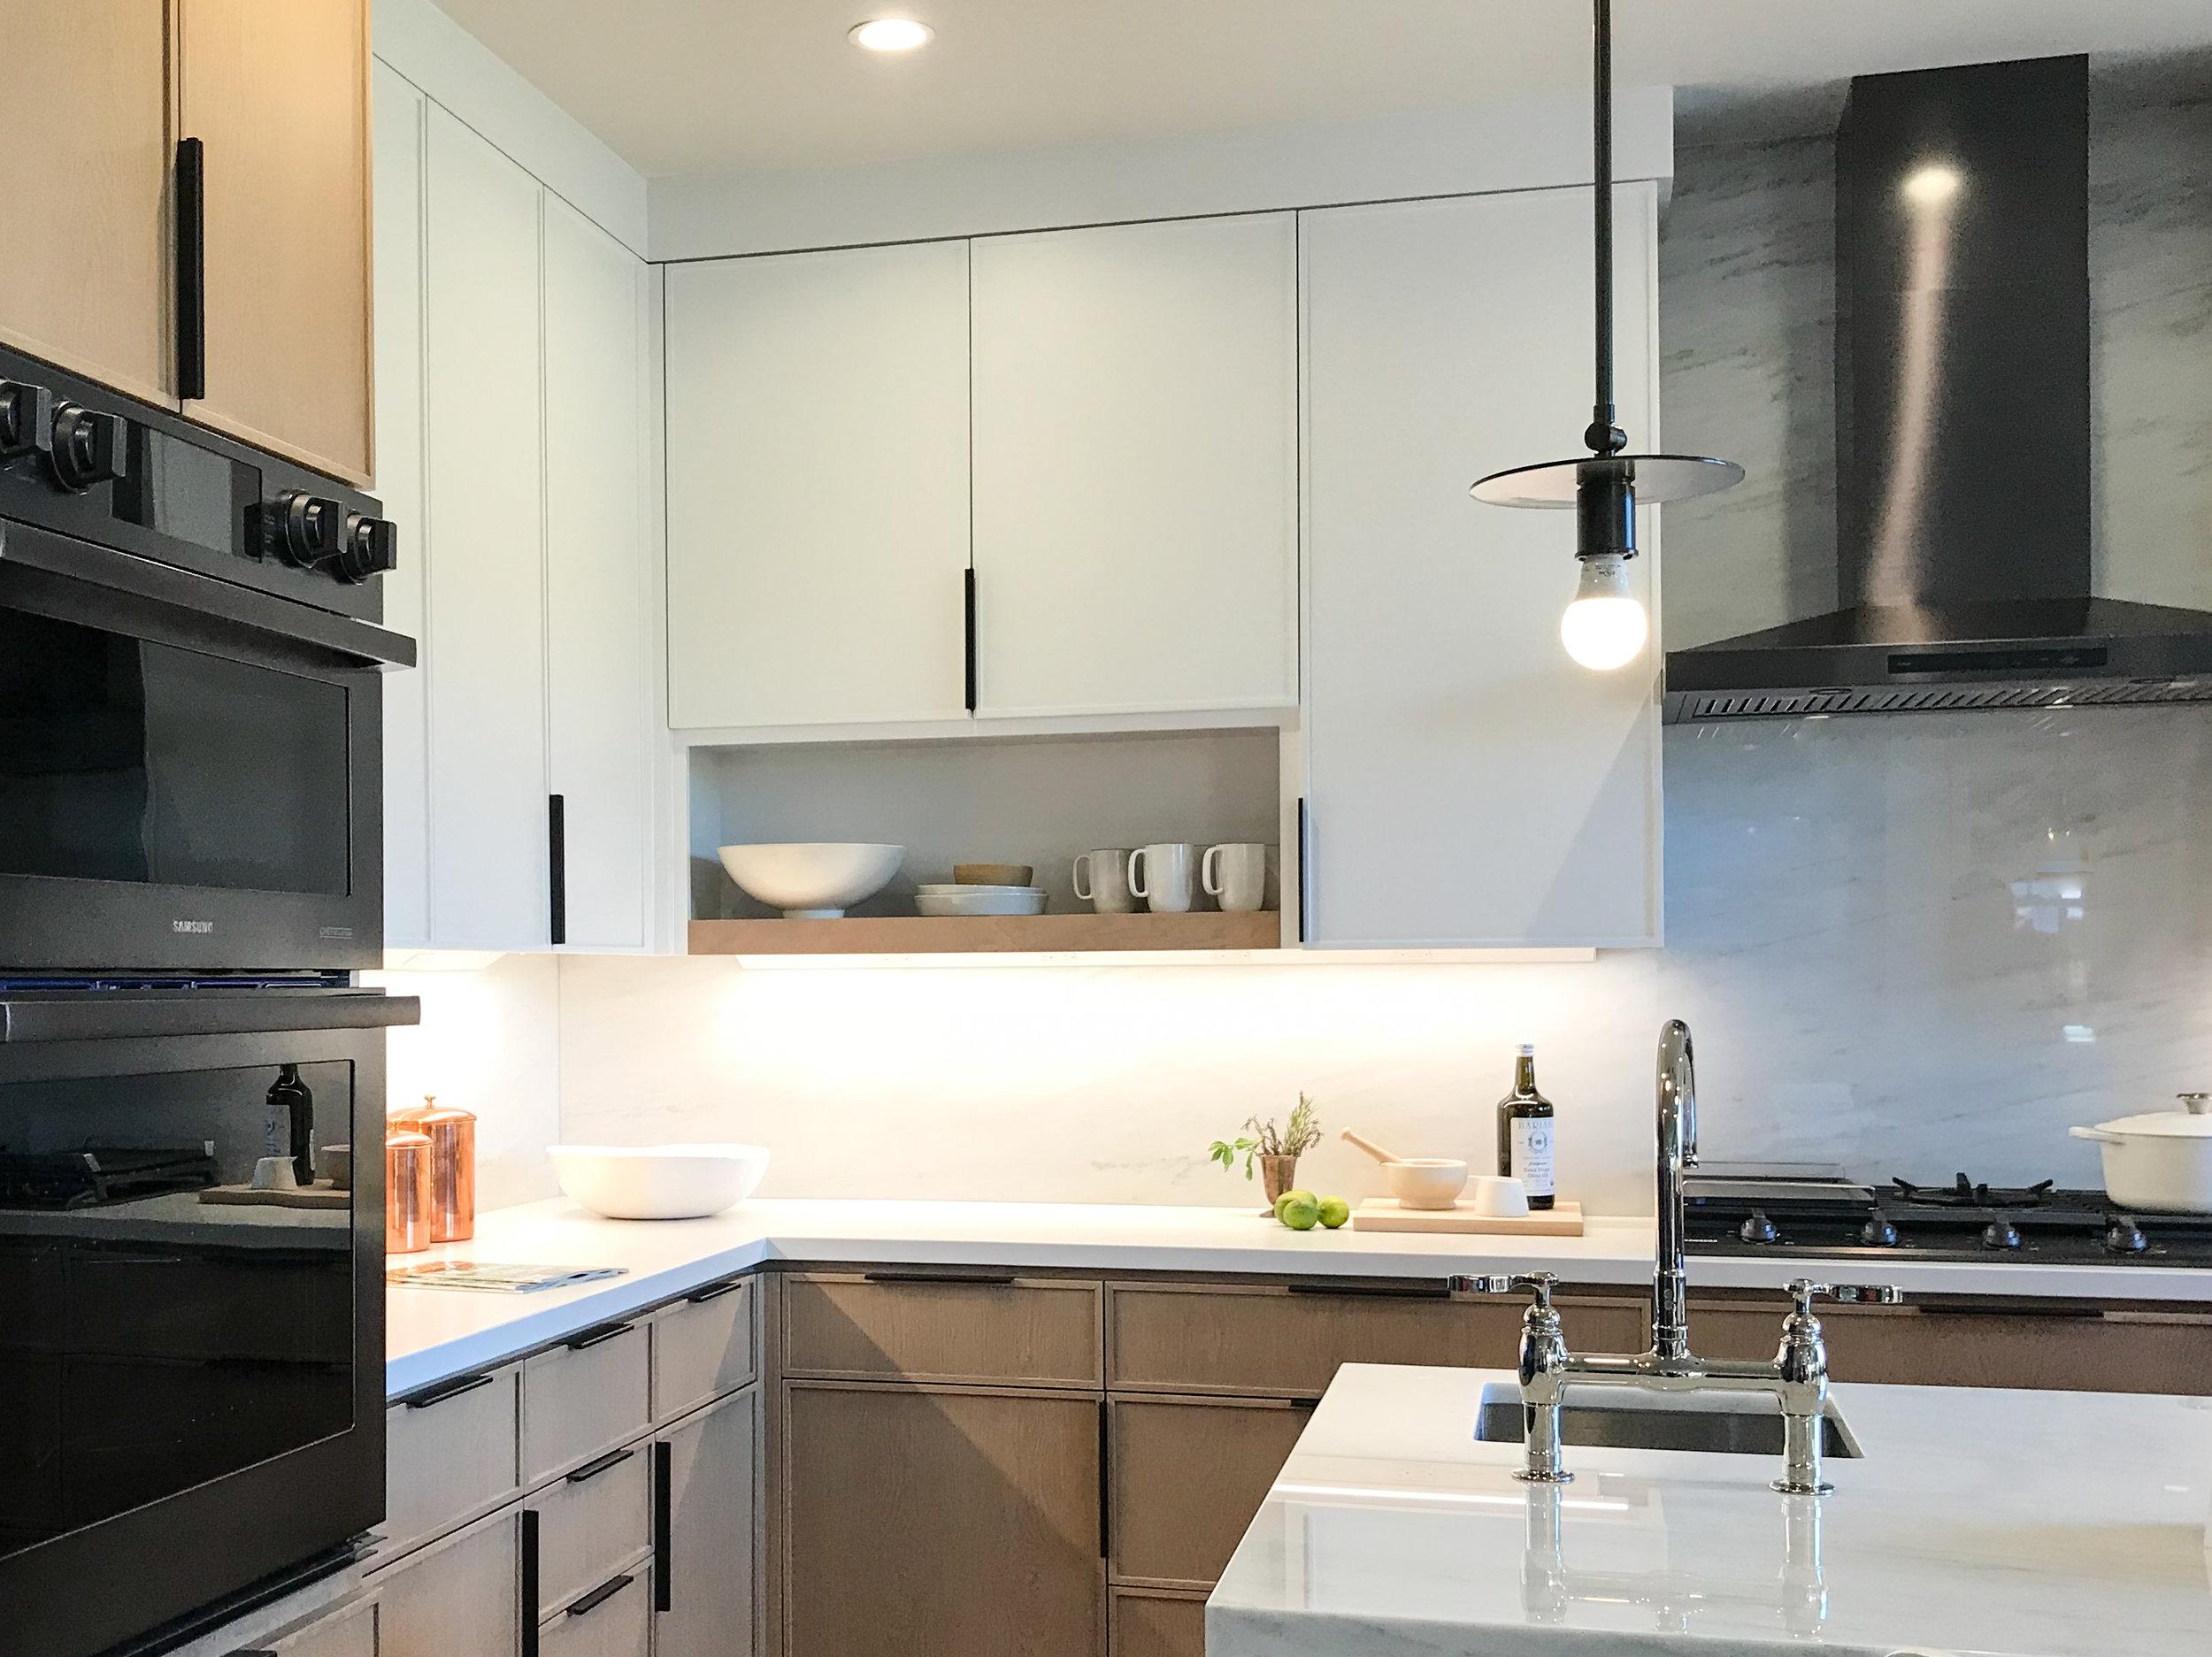 Photo taken at the Sunset Idea House 2018    Interior Designer: Lauren Nelson Design, Developer/Design Build Team: DeMattei Construction, Inc.